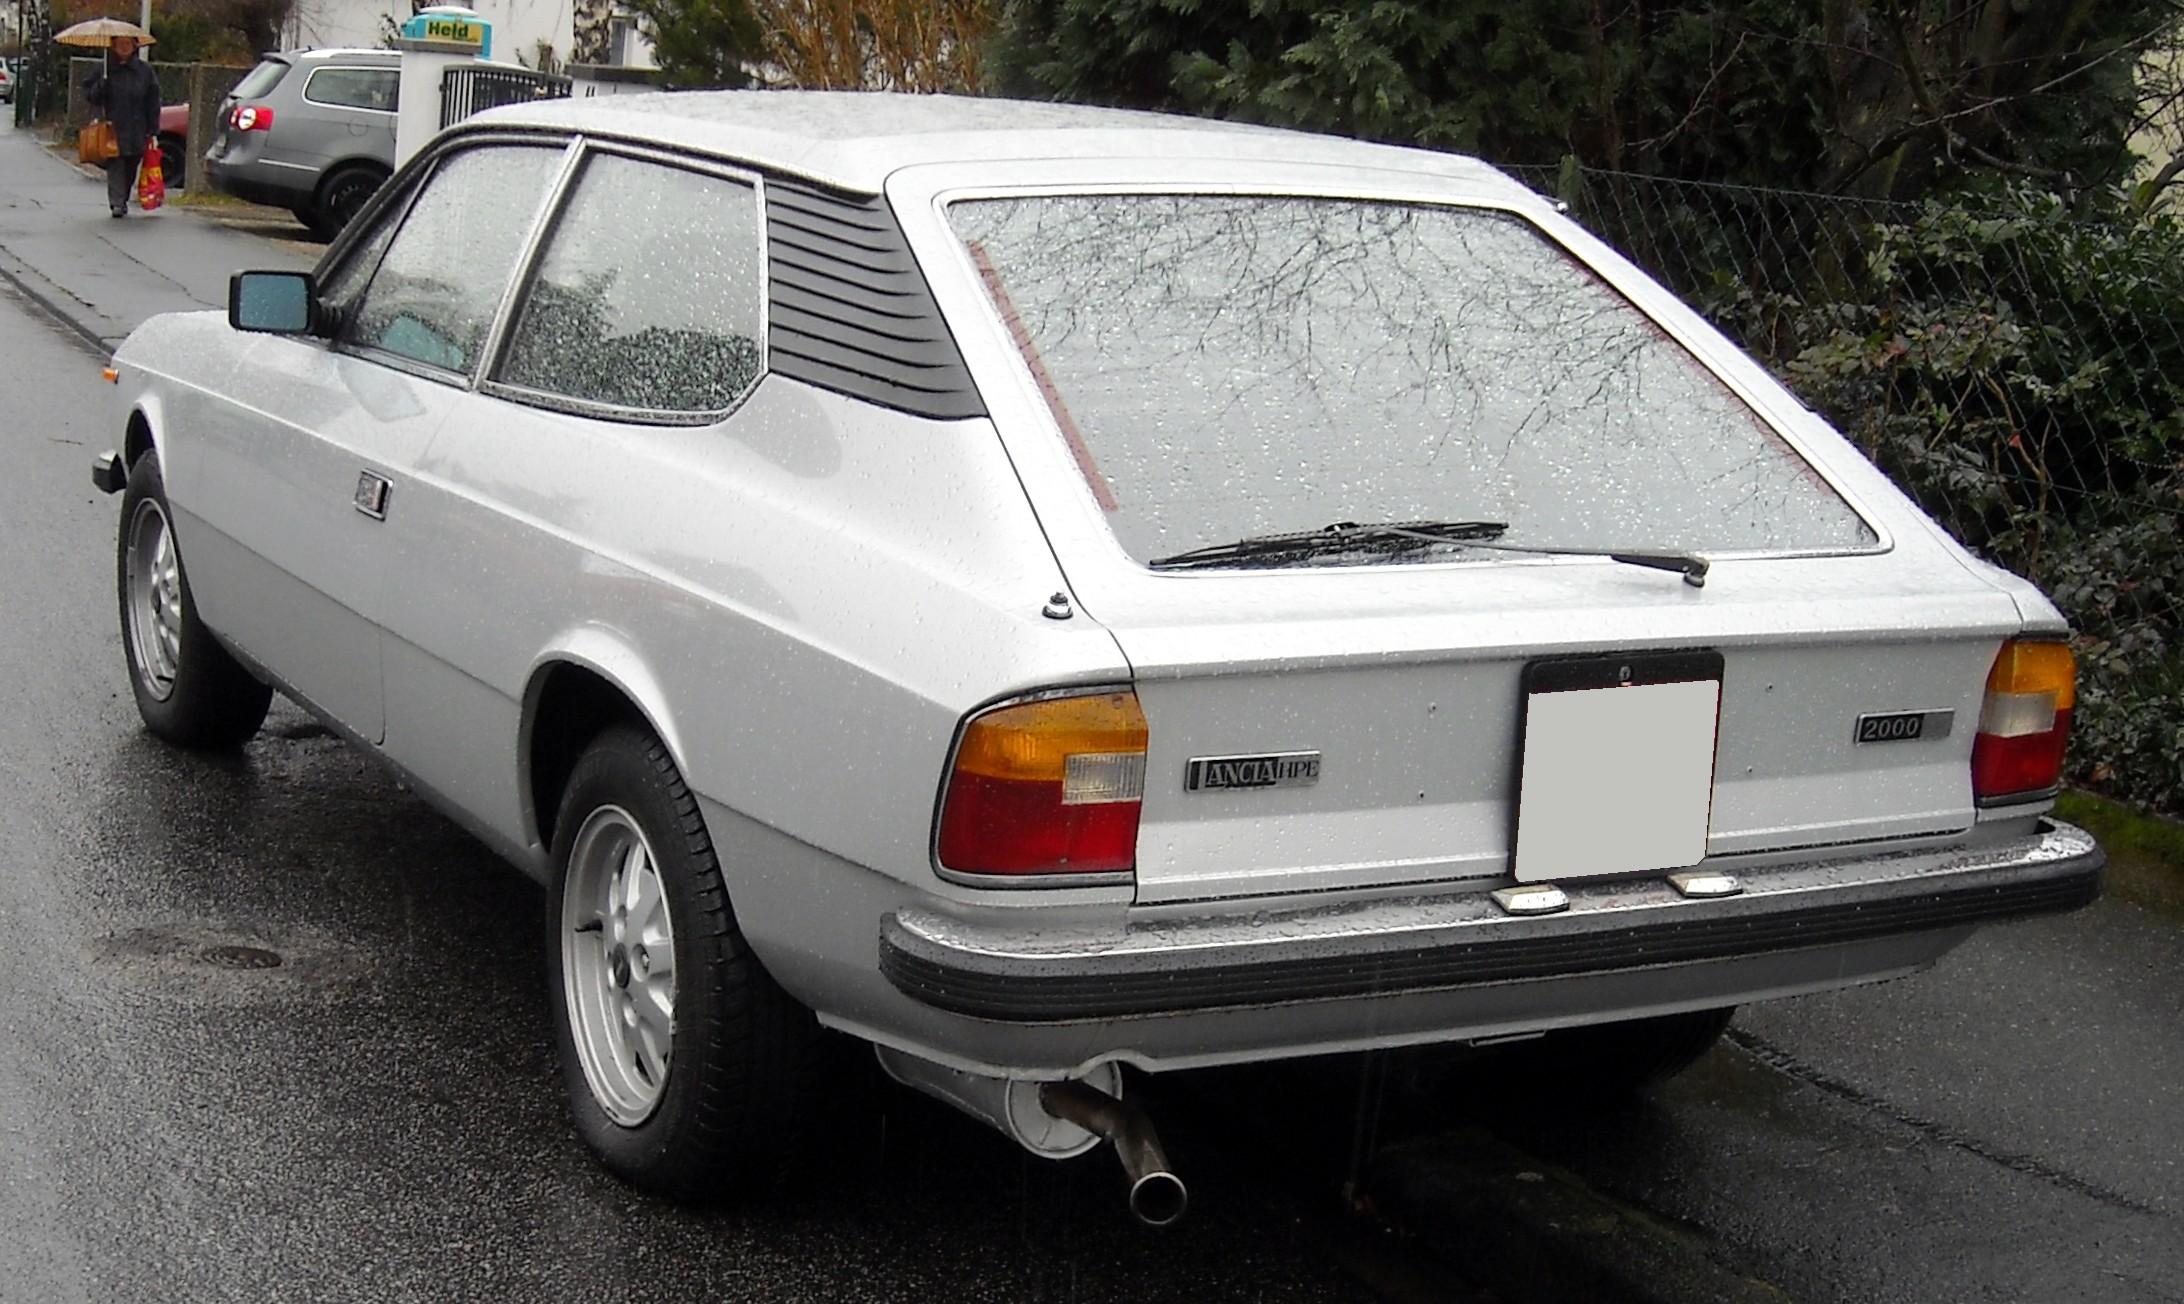 https://upload.wikimedia.org/wikipedia/commons/6/6e/Lancia_Beta_HPE_rear_20081203.jpg